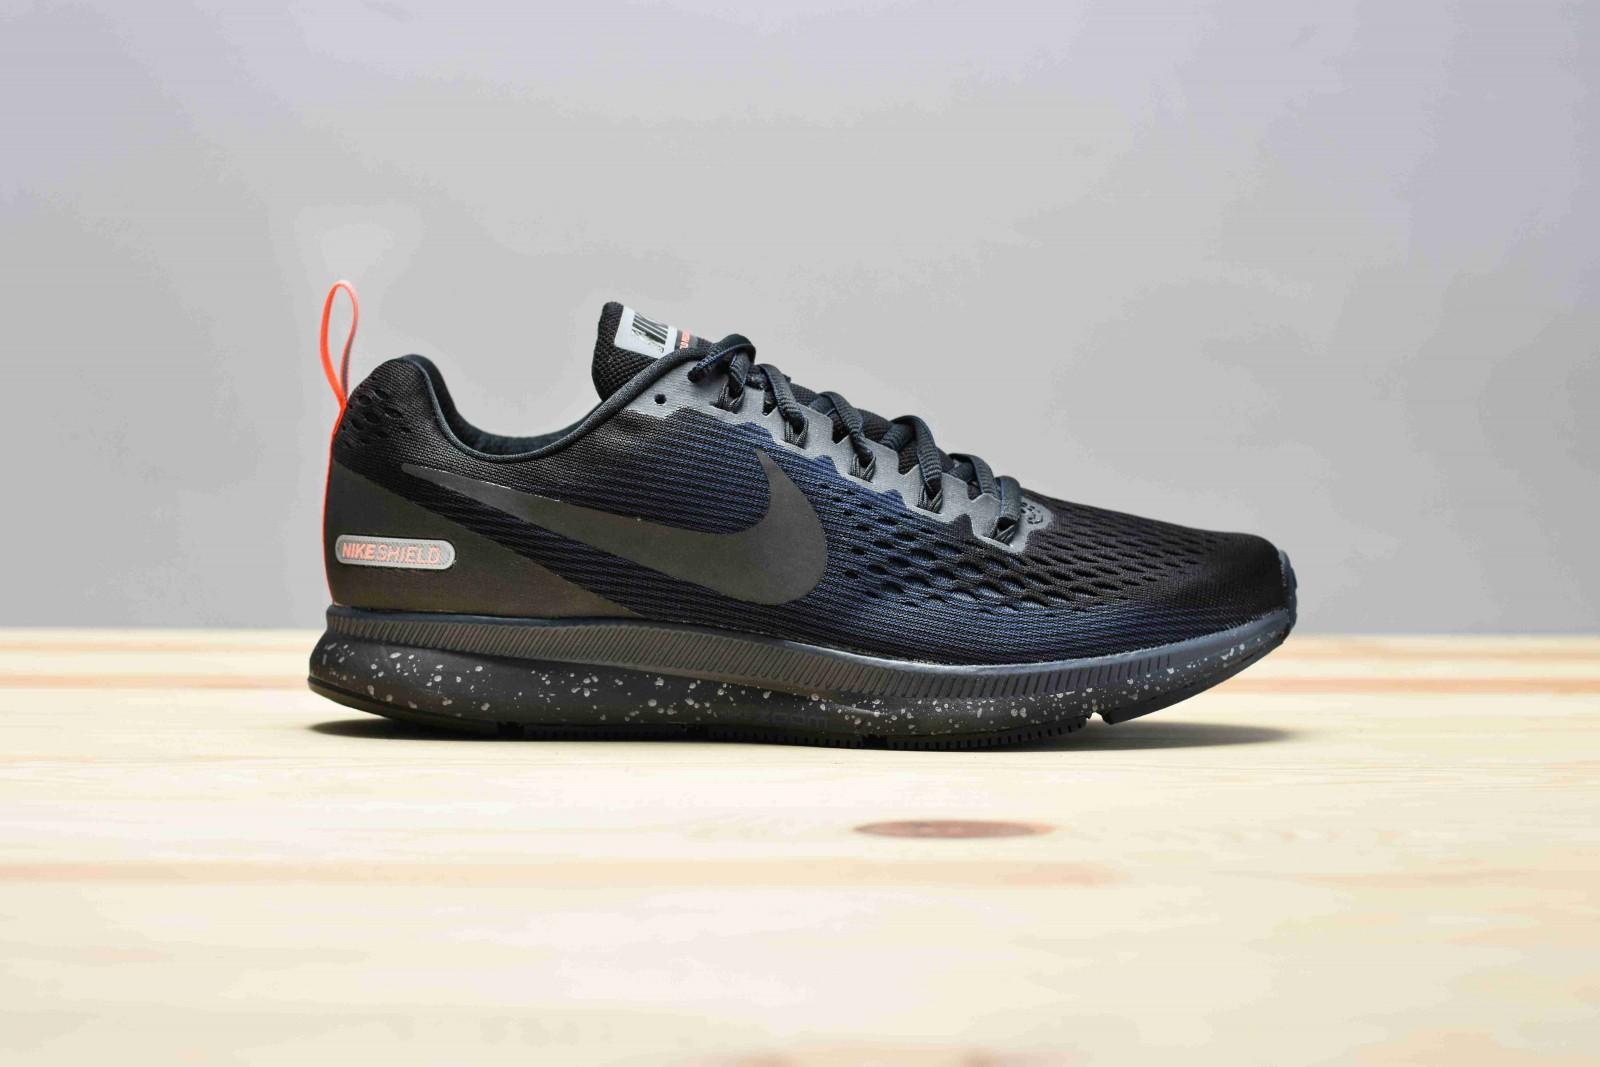 Pánské Běžecké boty Nike AIR ZOOM PEGASUS 34 SHIELD  f0bc9615235